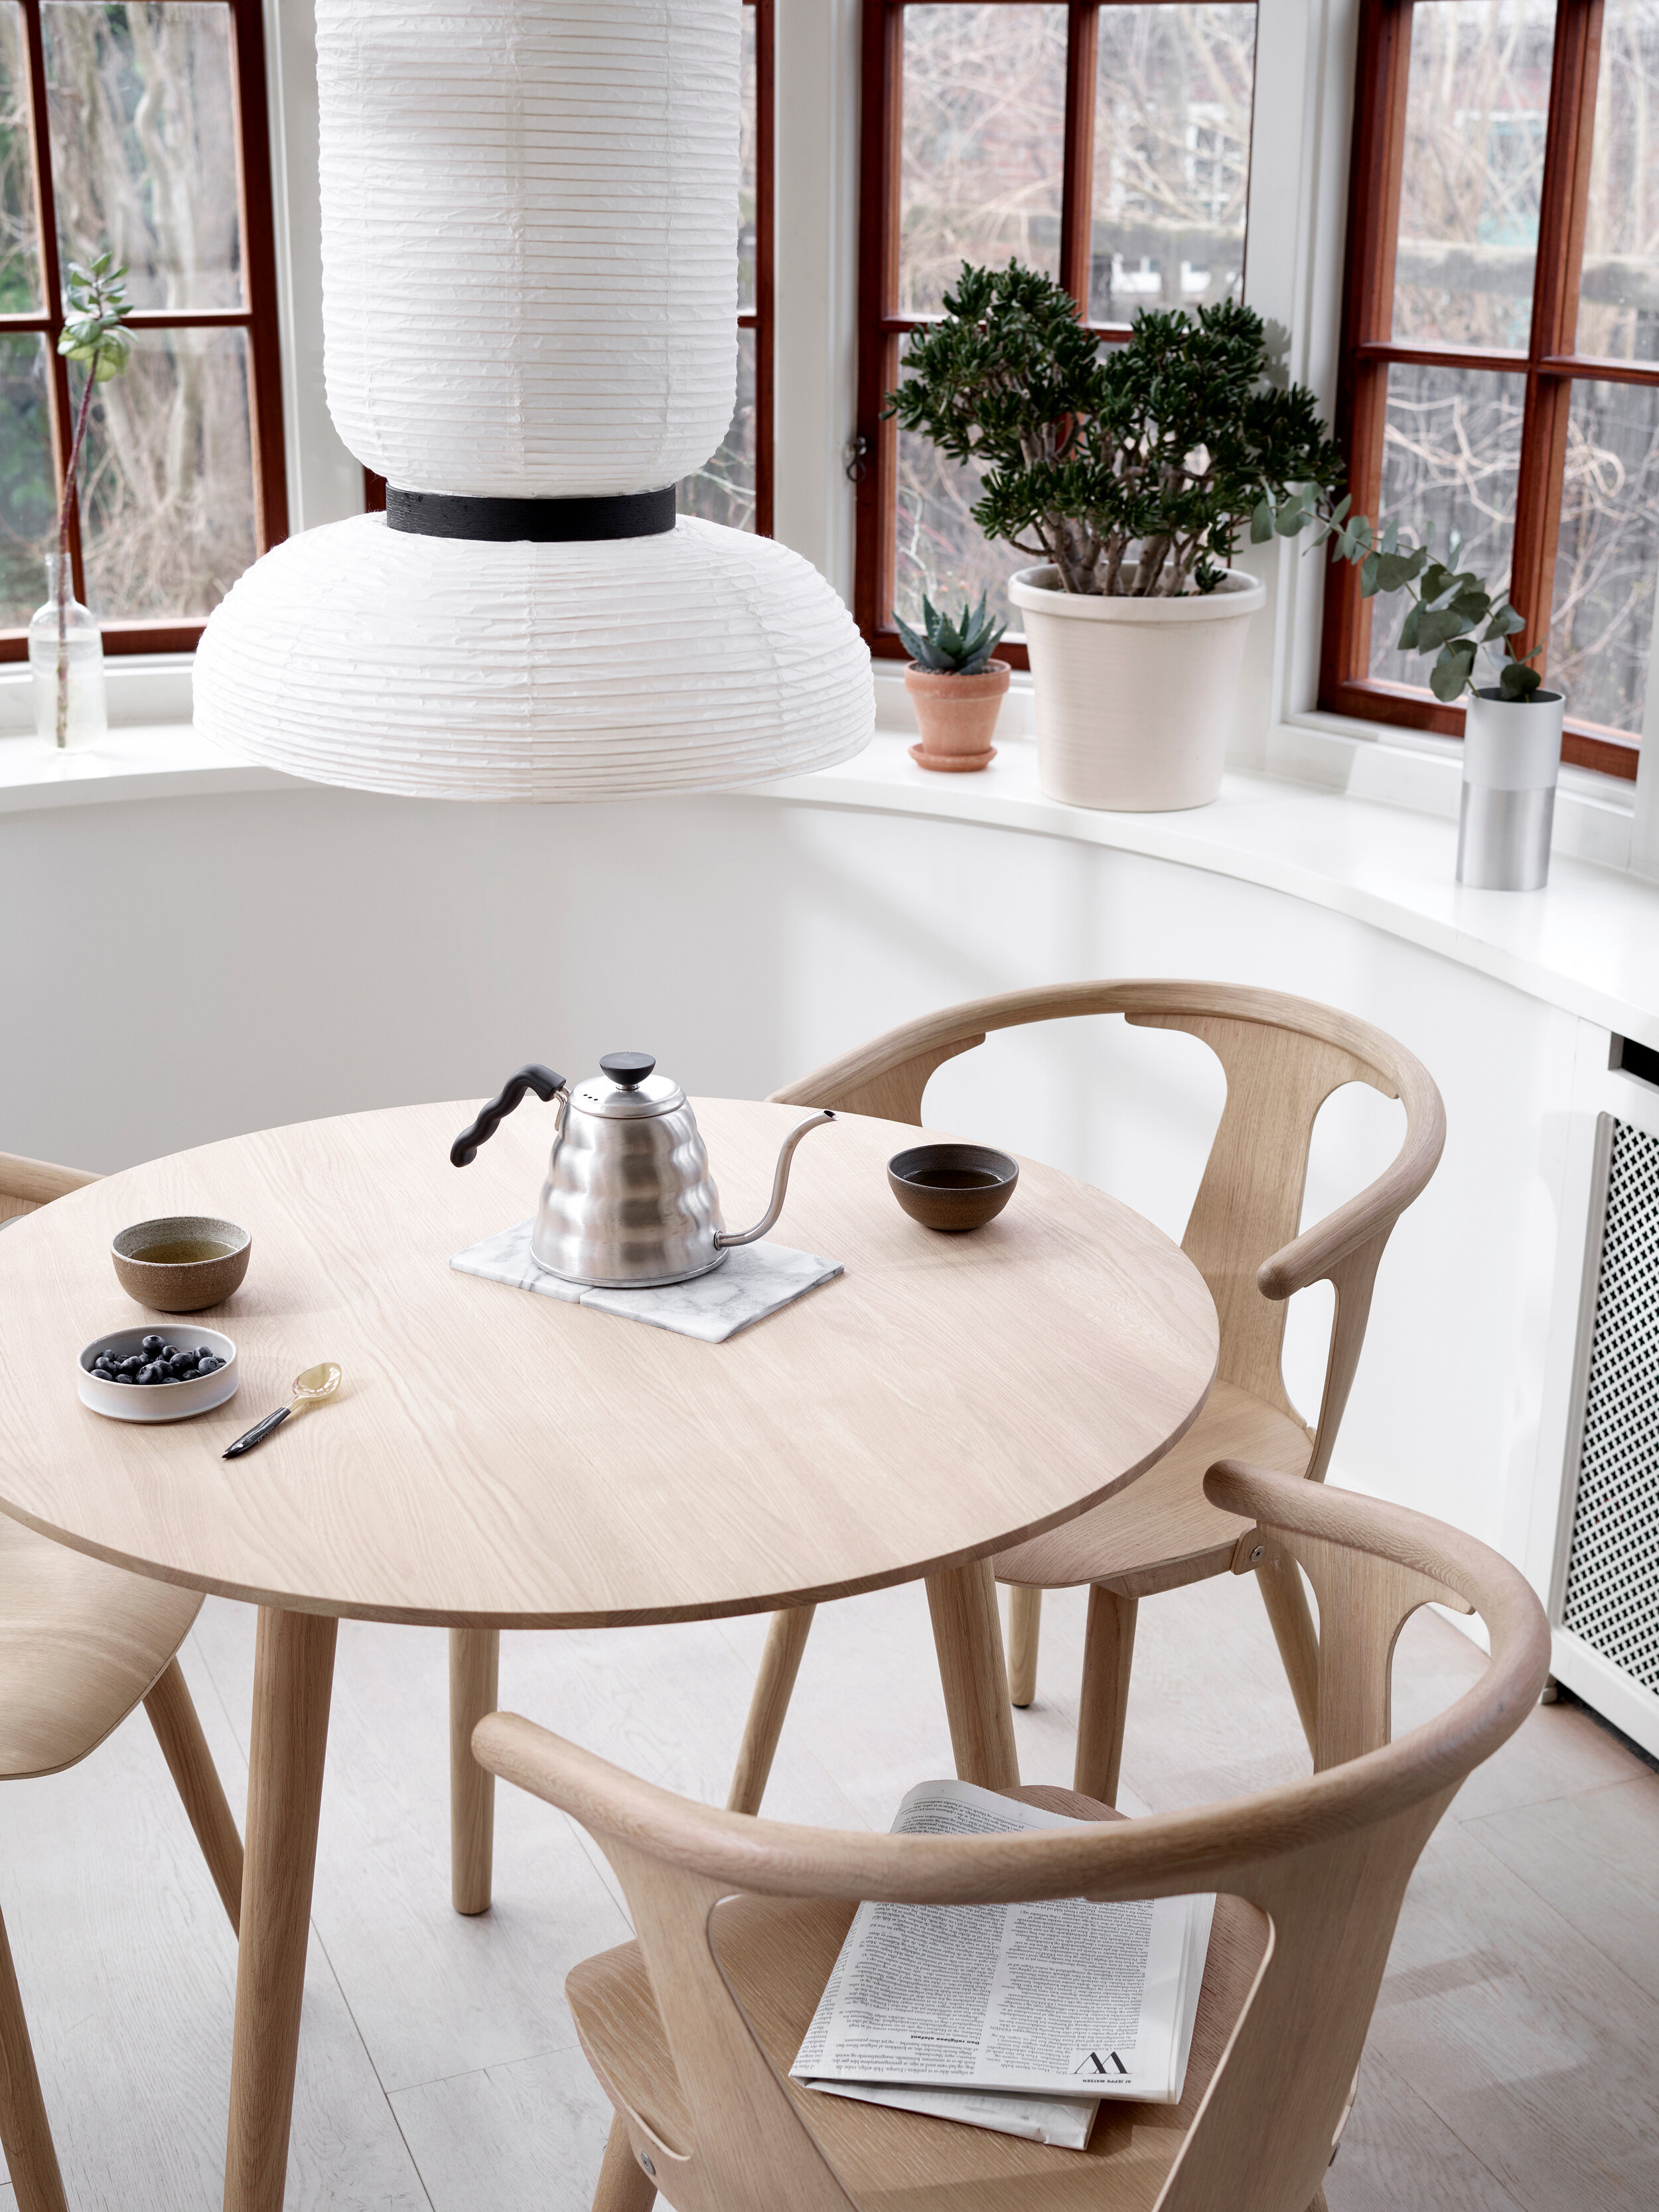 ATD_Location16.12_InBetween_Table_Chair_Formakarmi.jpg